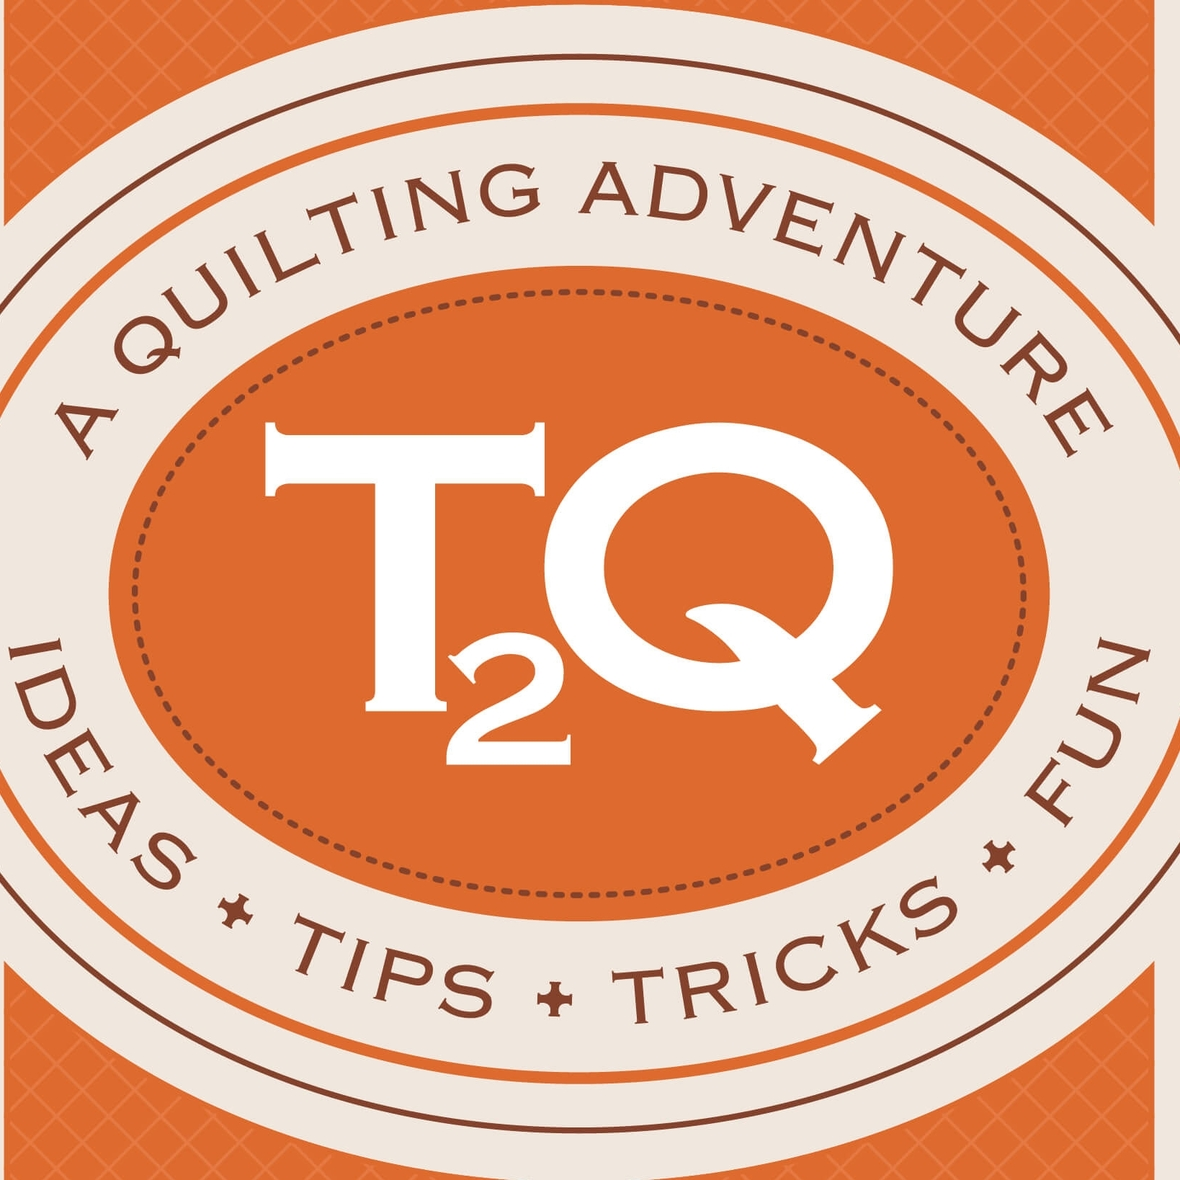 t2q logo